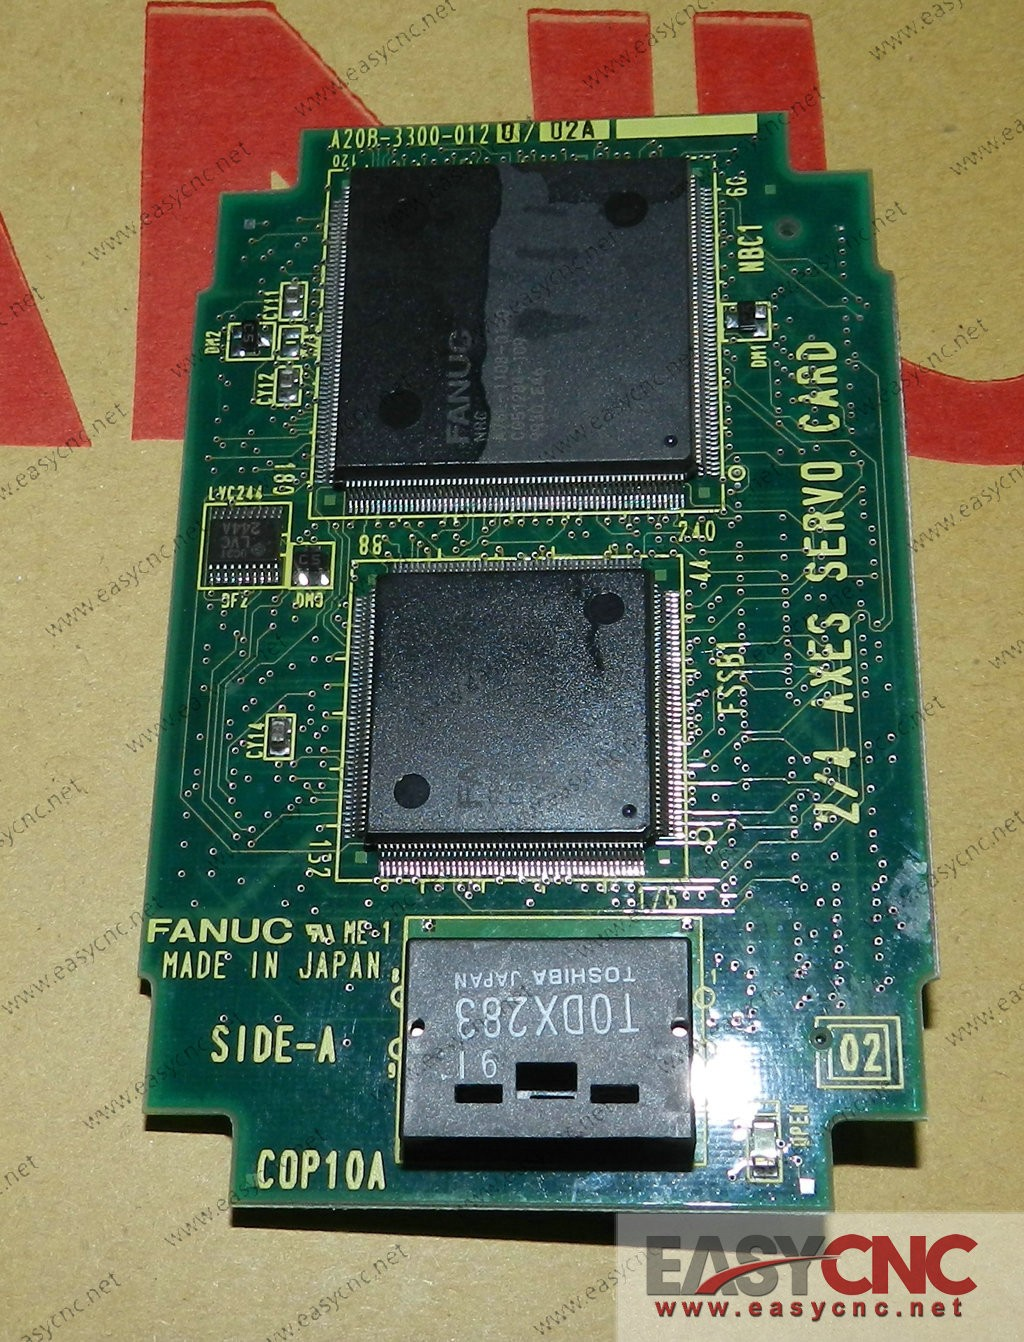 FANUC A20B-3300-0120